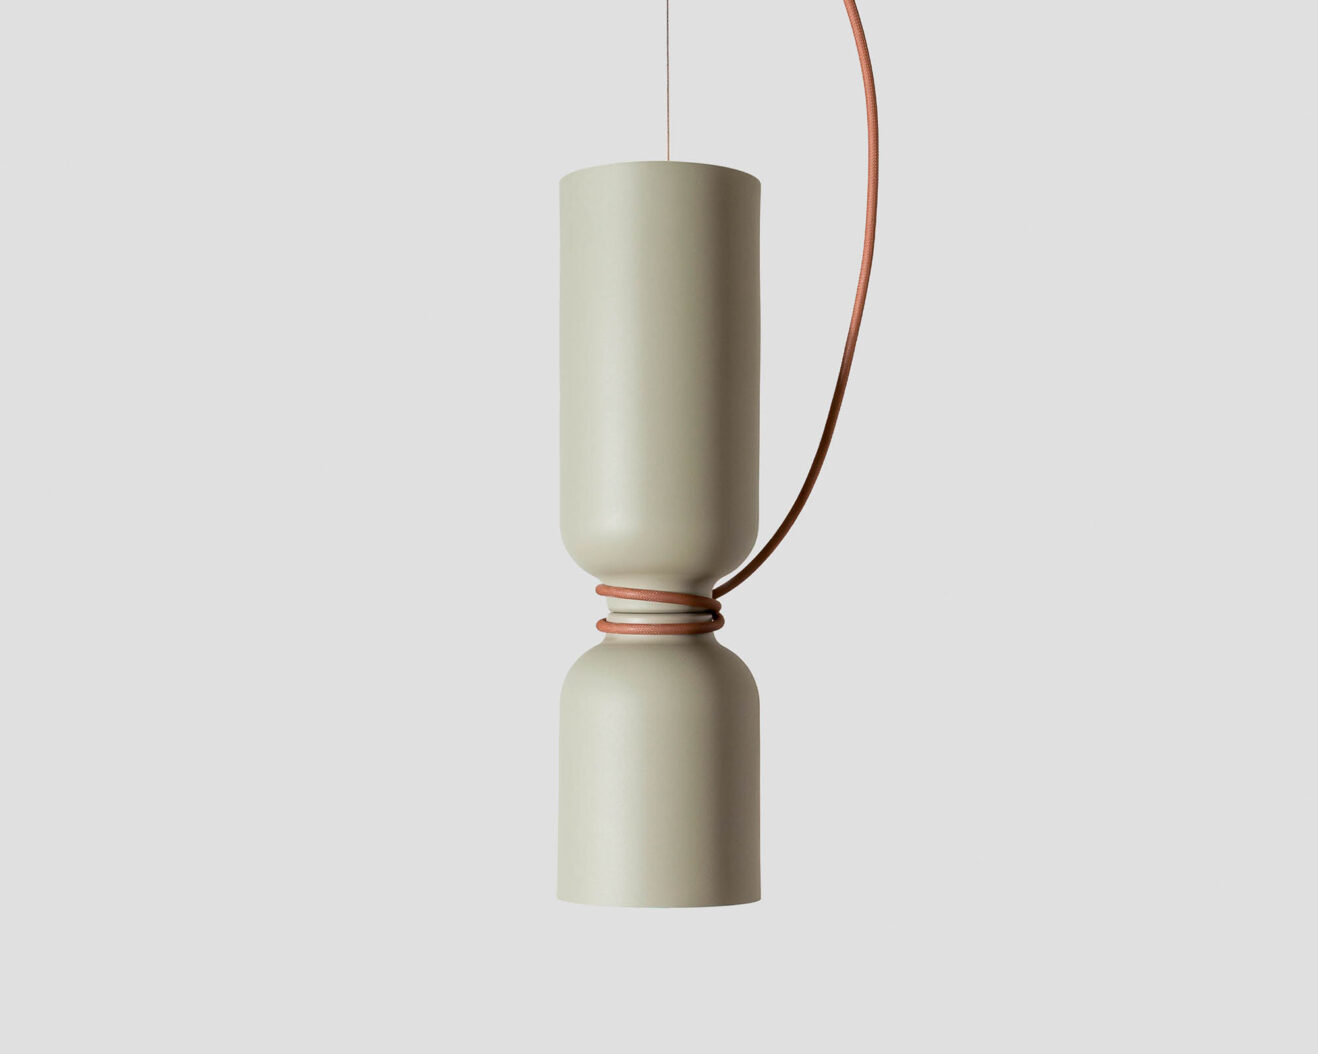 Andlight-Pendant-Lamp-CD-Sage-Savannah Bay Gallery